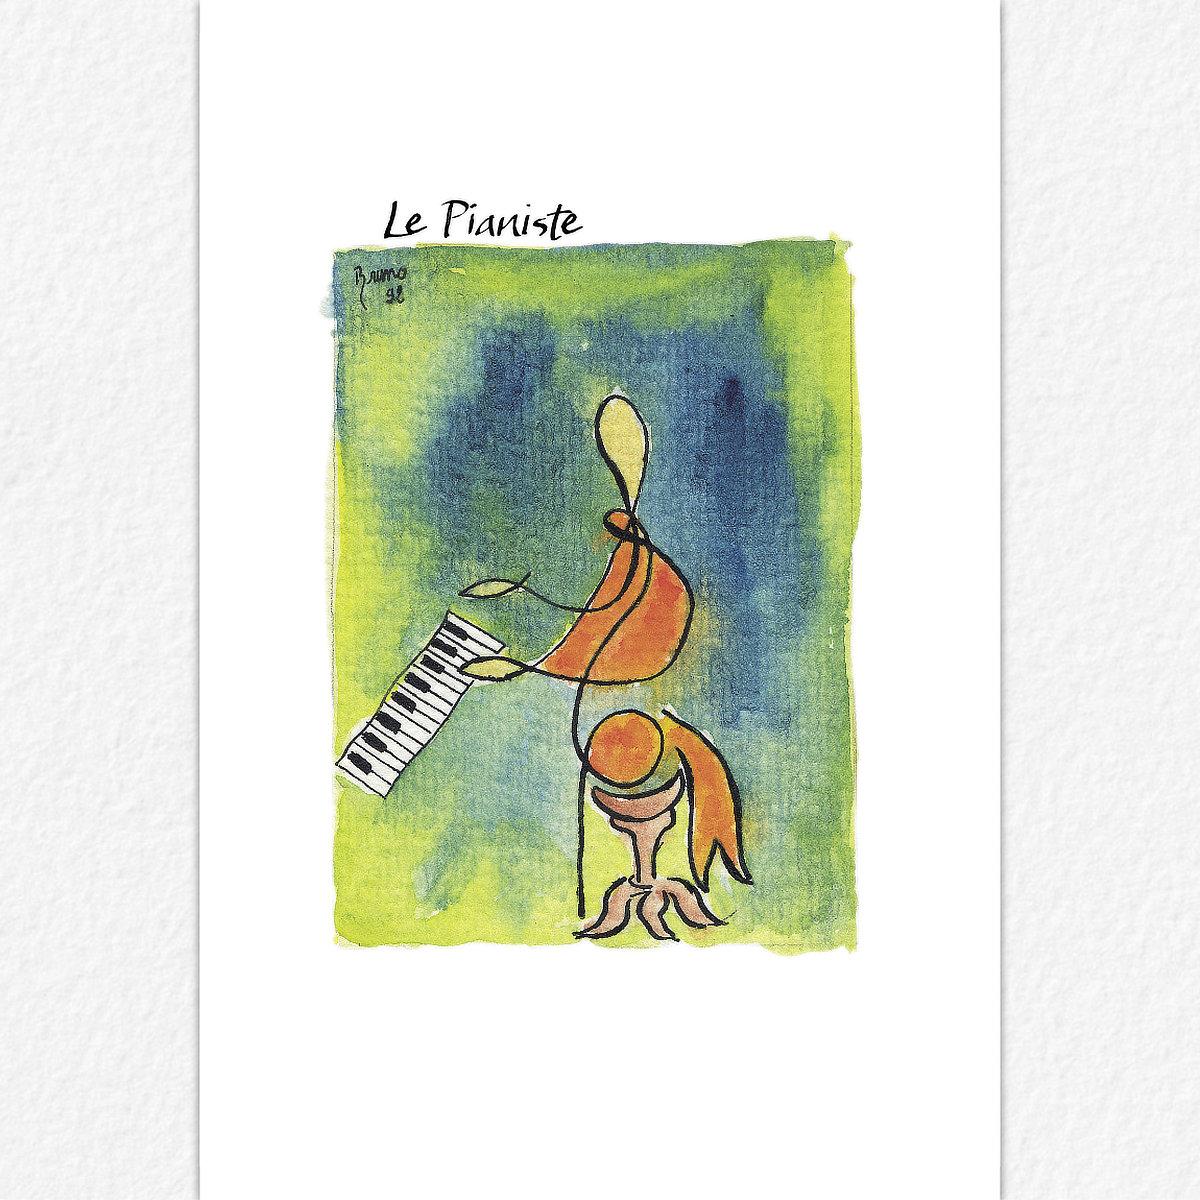 Le Pianiste - carte postale